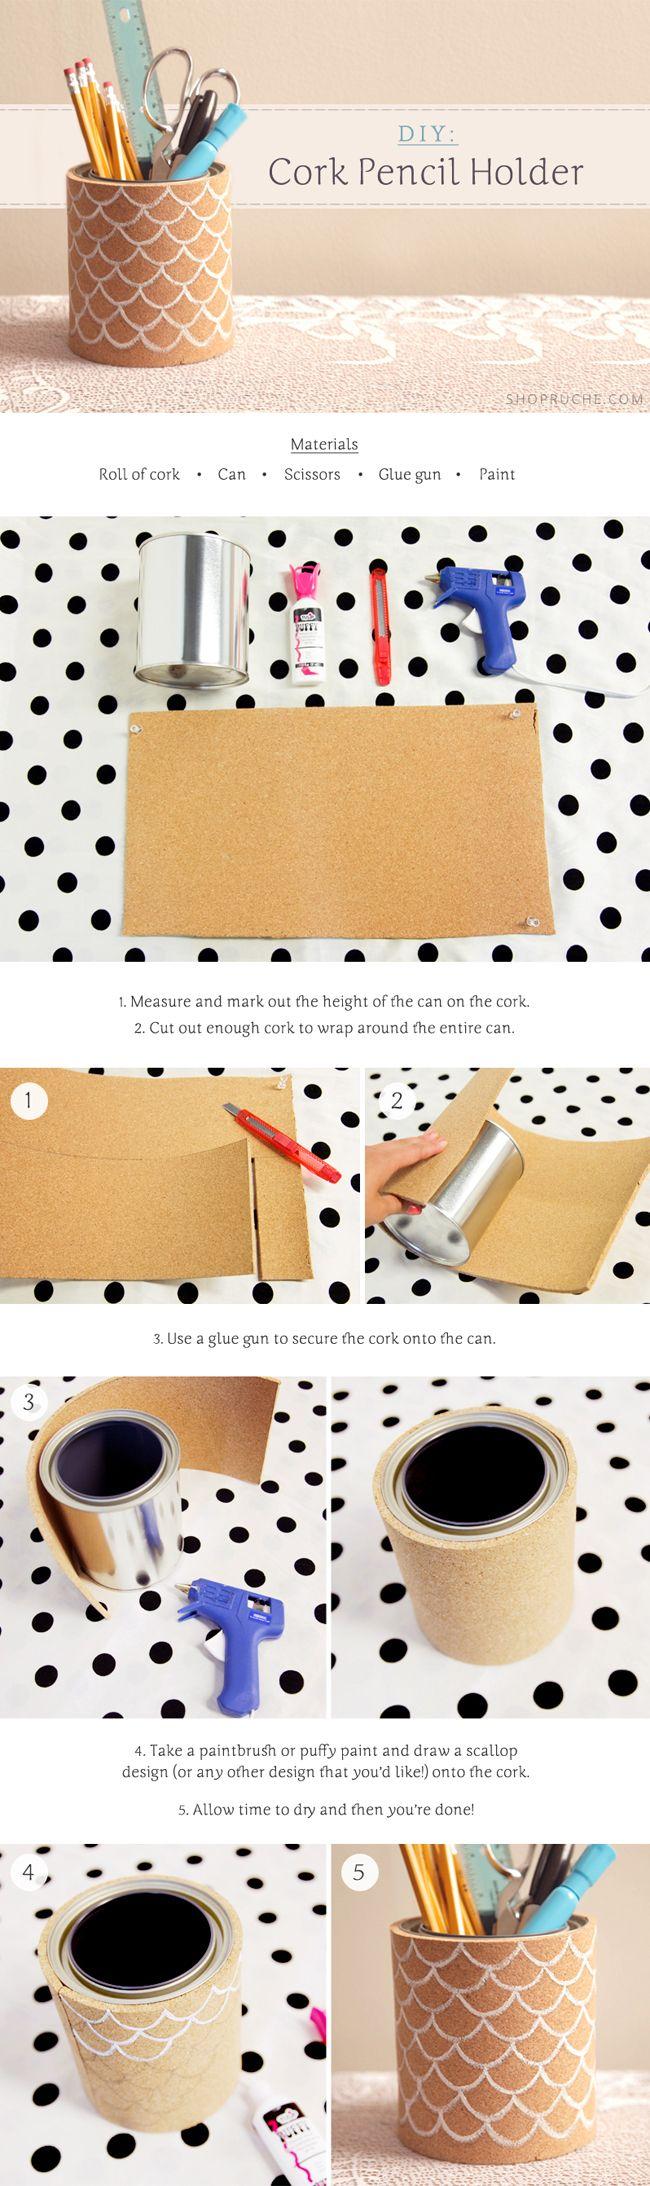 DIY Cork Pencil Holder